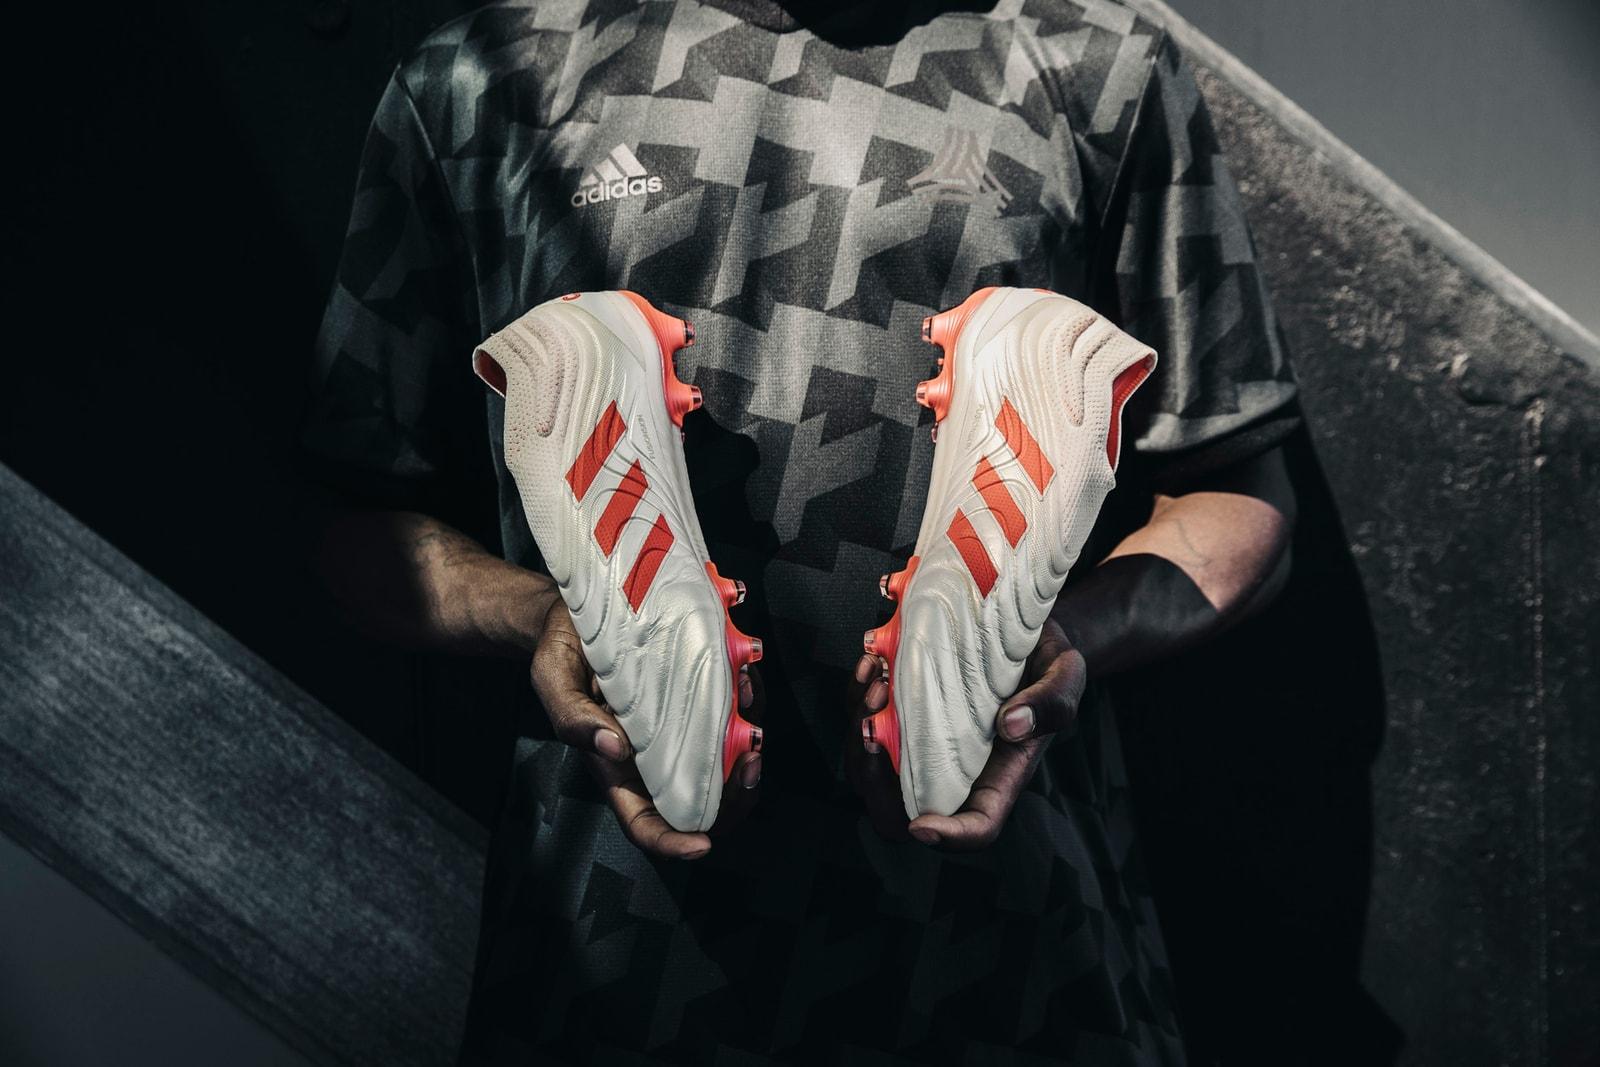 Paulo Dybala adidas Football Copa 19+ Interview soccer milan interviews juventus f c